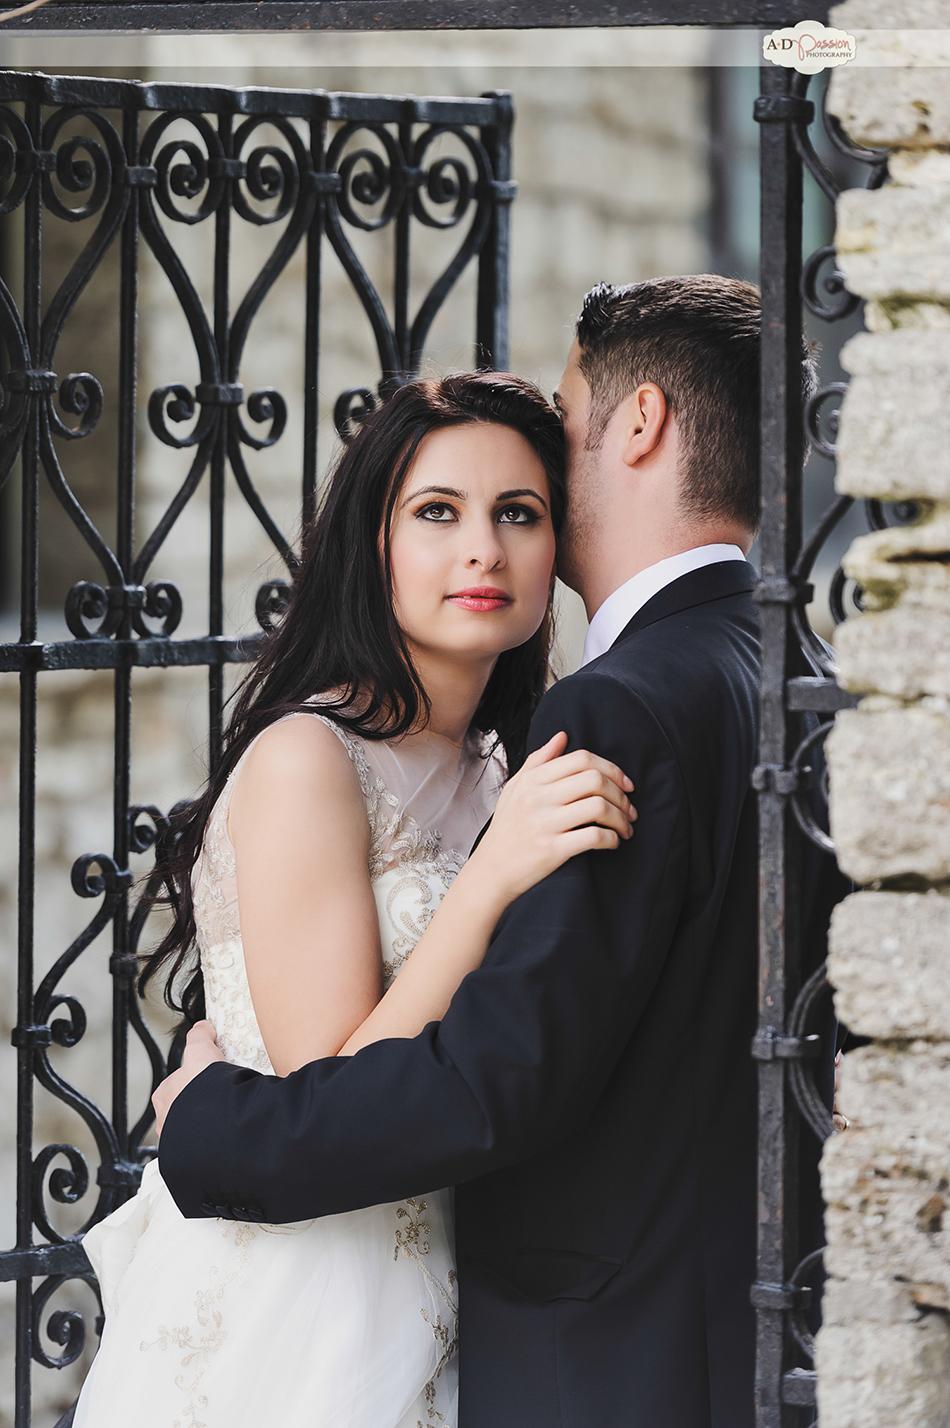 AD Passion Photography | 20131008_fotograf-nunta-profesionist_after-wedding-balchik_razvan-si-eliza_0081 | Adelin, Dida, fotograf profesionist, fotograf de nunta, fotografie de nunta, fotograf Timisoara, fotograf Craiova, fotograf Bucuresti, fotograf Arad, nunta Timisoara, nunta Arad, nunta Bucuresti, nunta Craiova